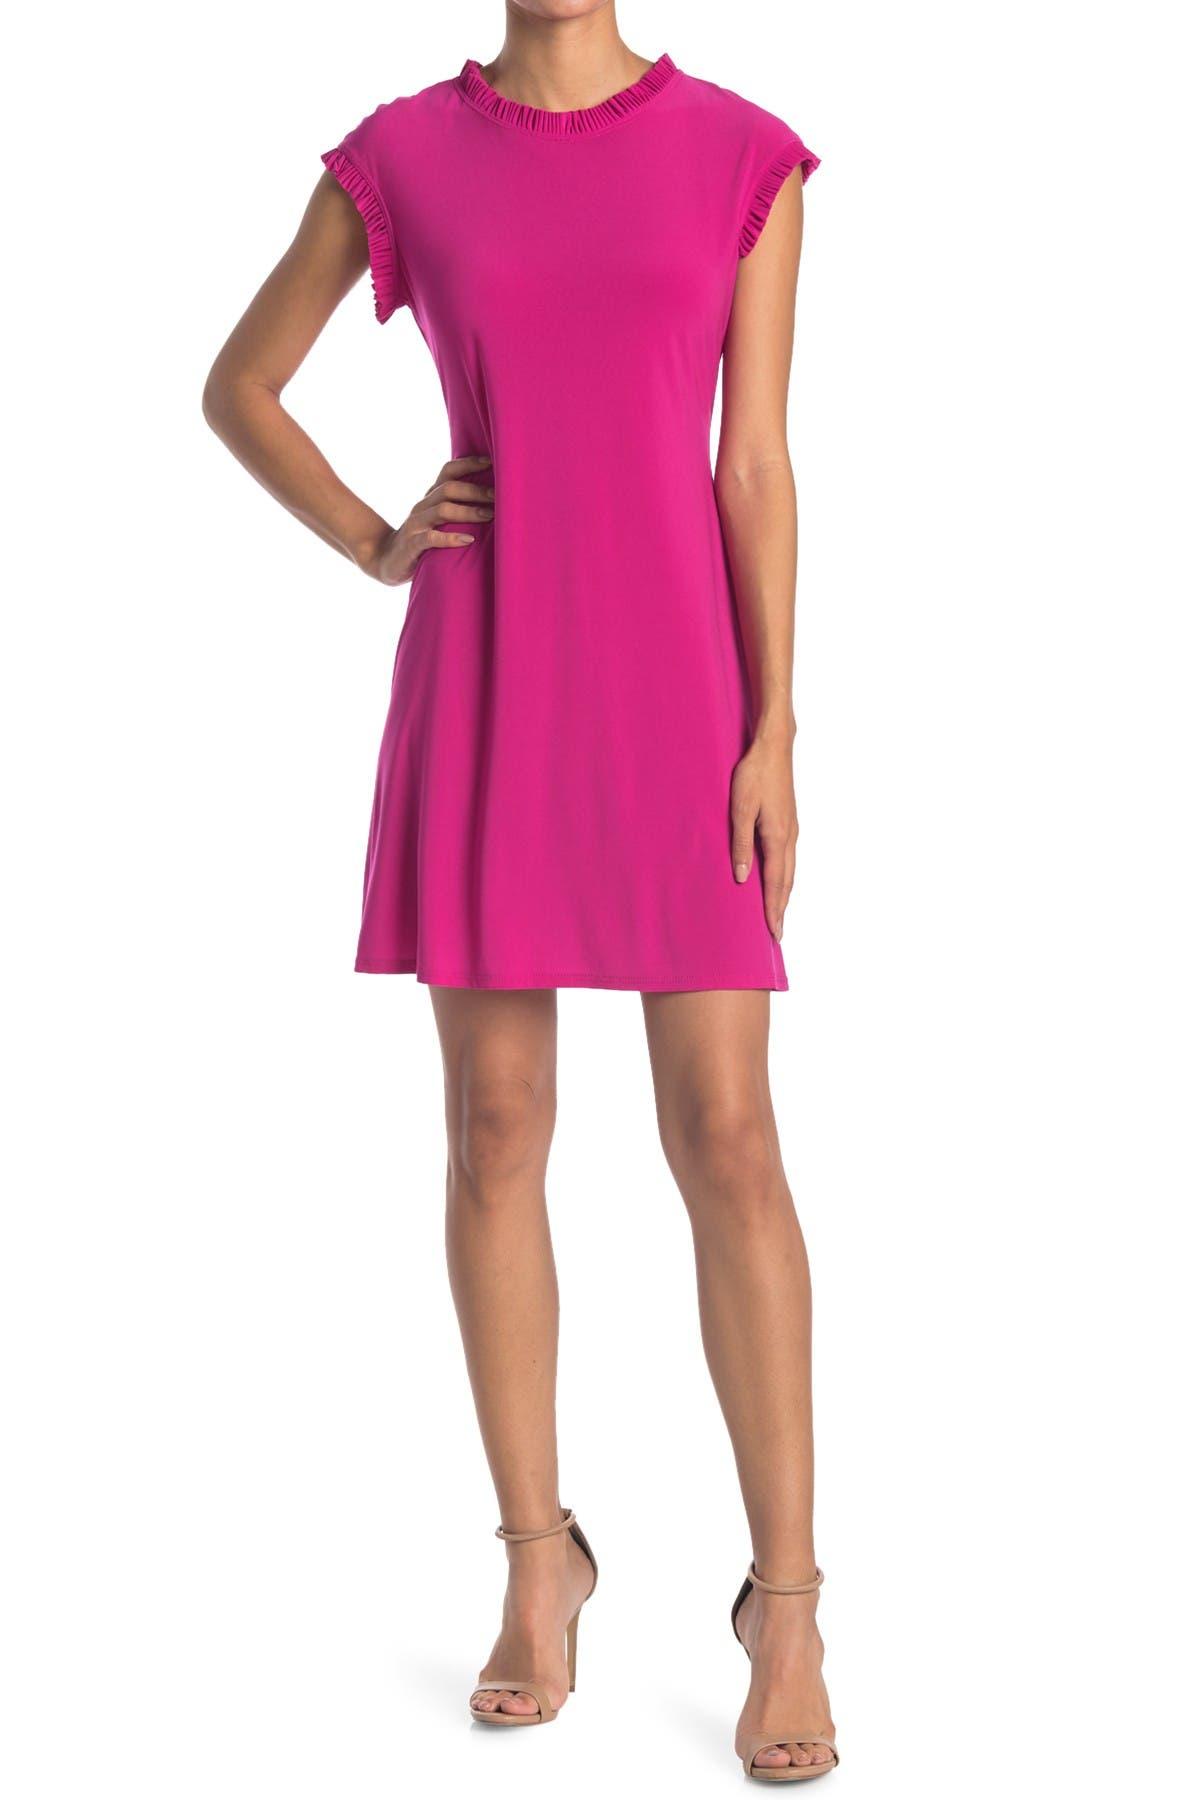 Image of TASH + SOPHIE Jersey Ruffle A-Line Dress